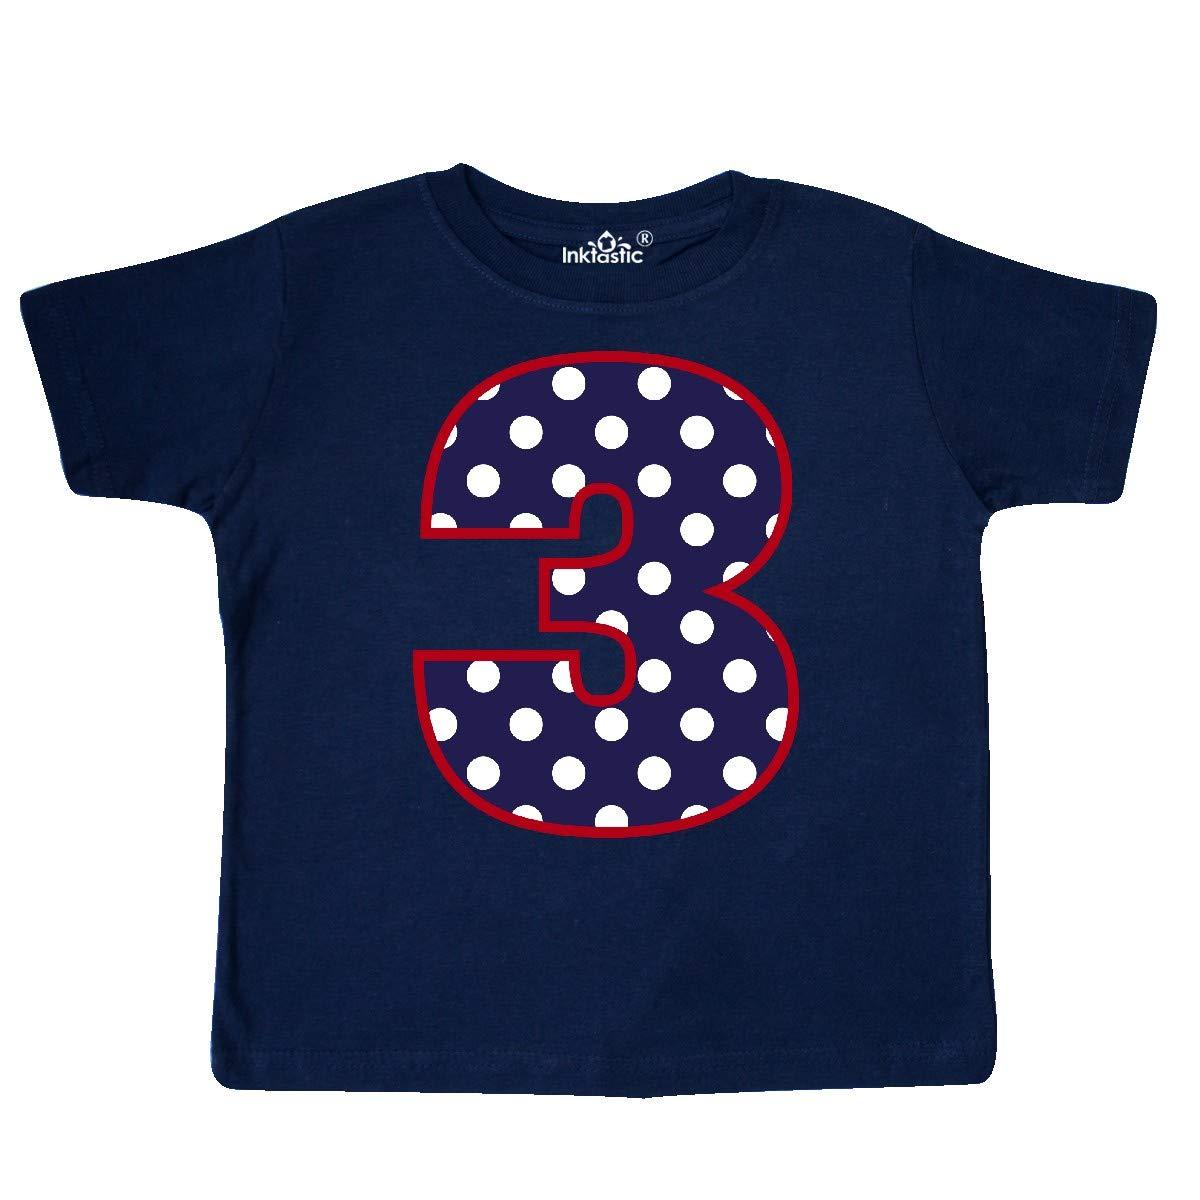 inktastic 3rd Birthday Polka Dot 3 Year Old Toddler T-Shirt